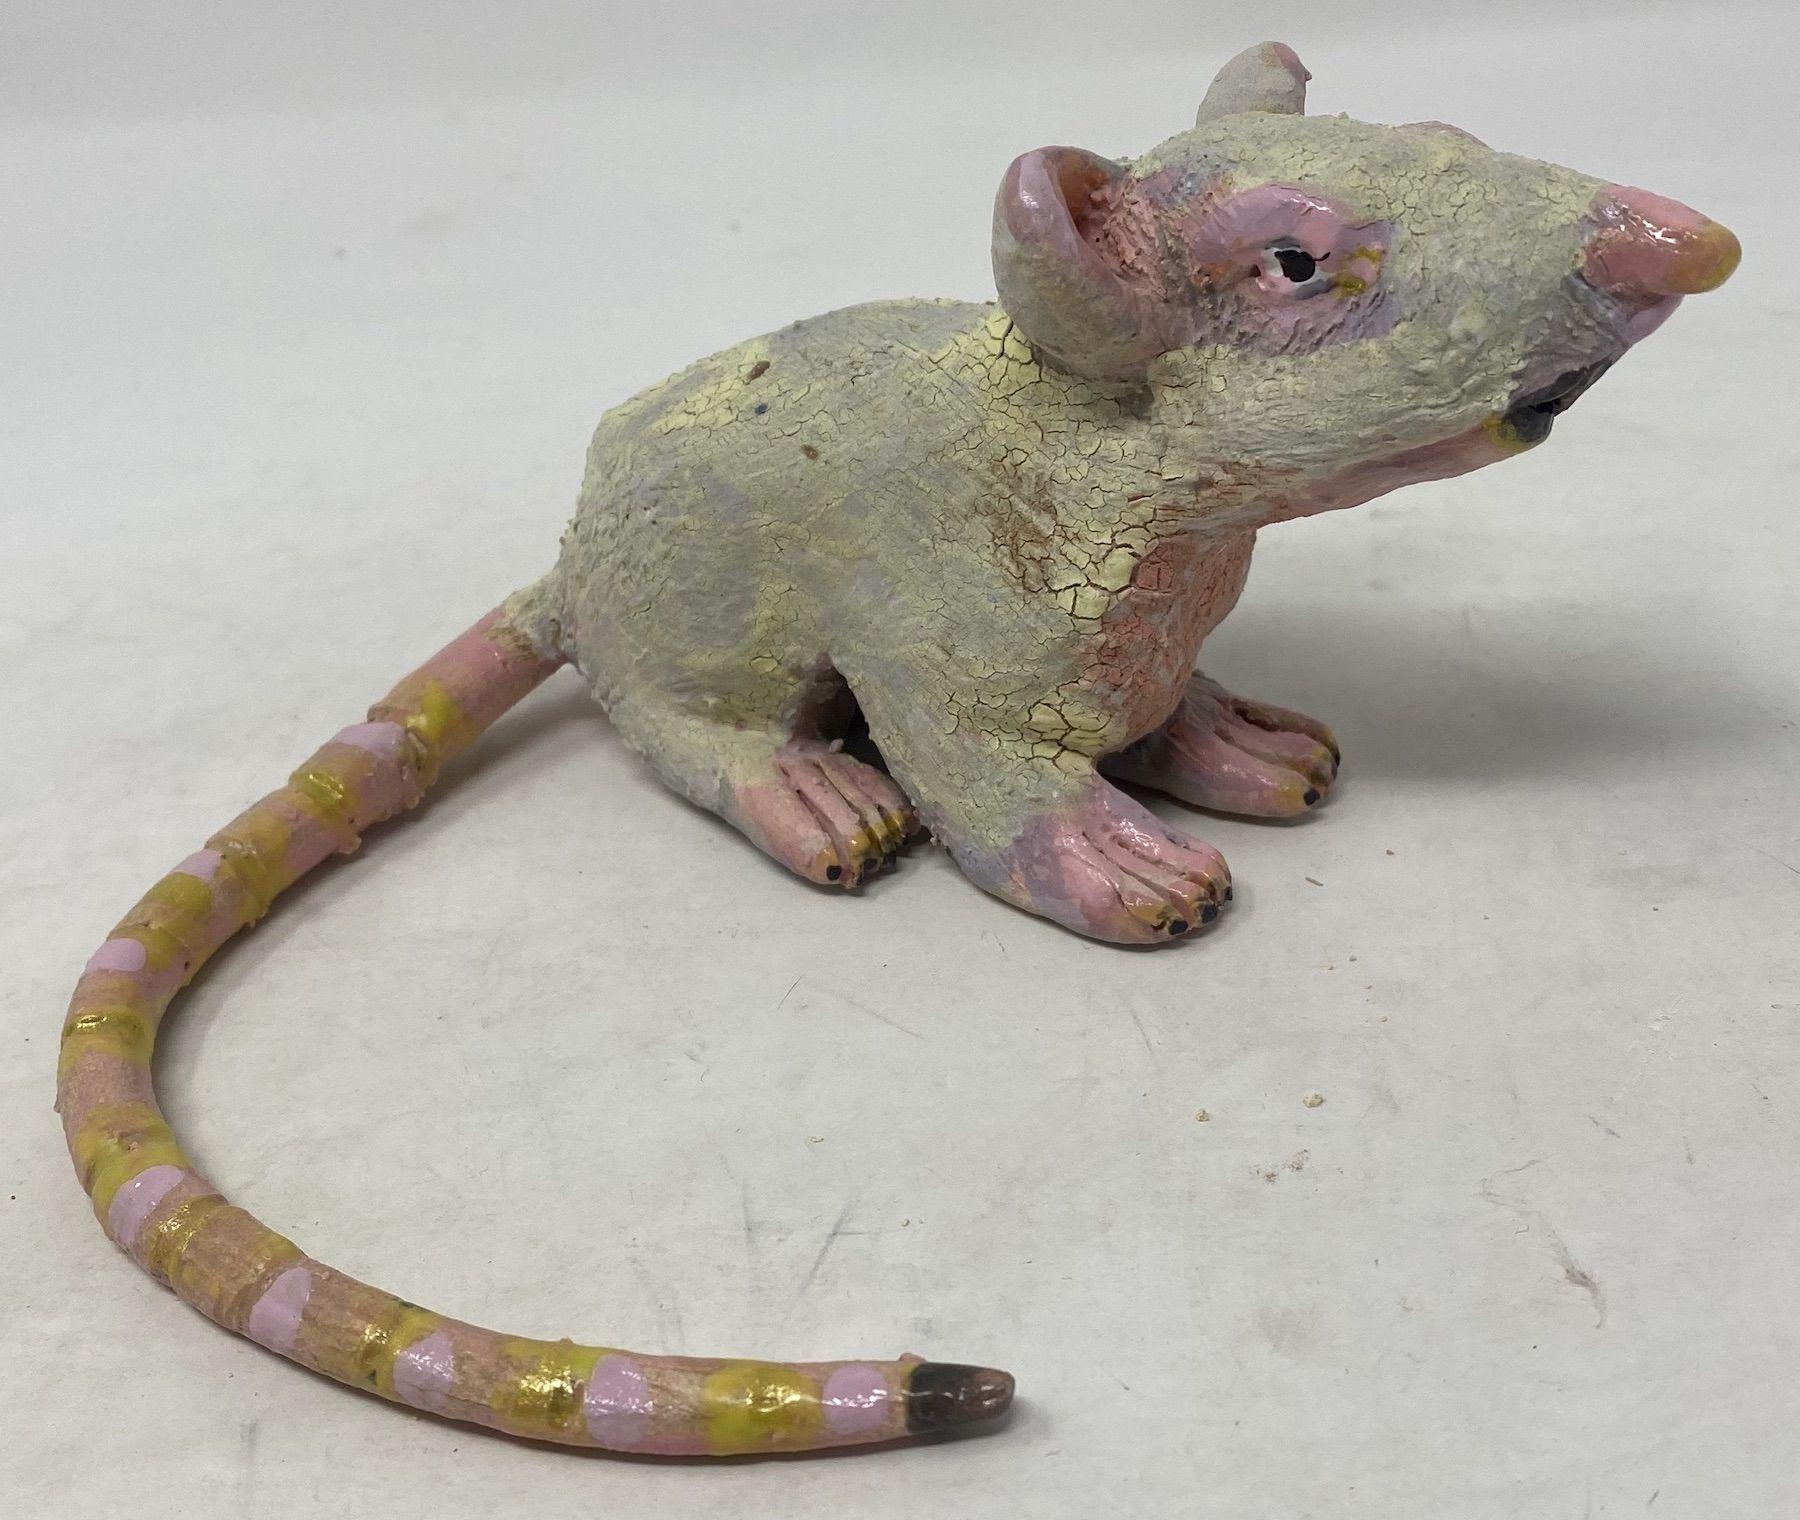 JENNY DAY, Sickly Yellow Rat, 2021